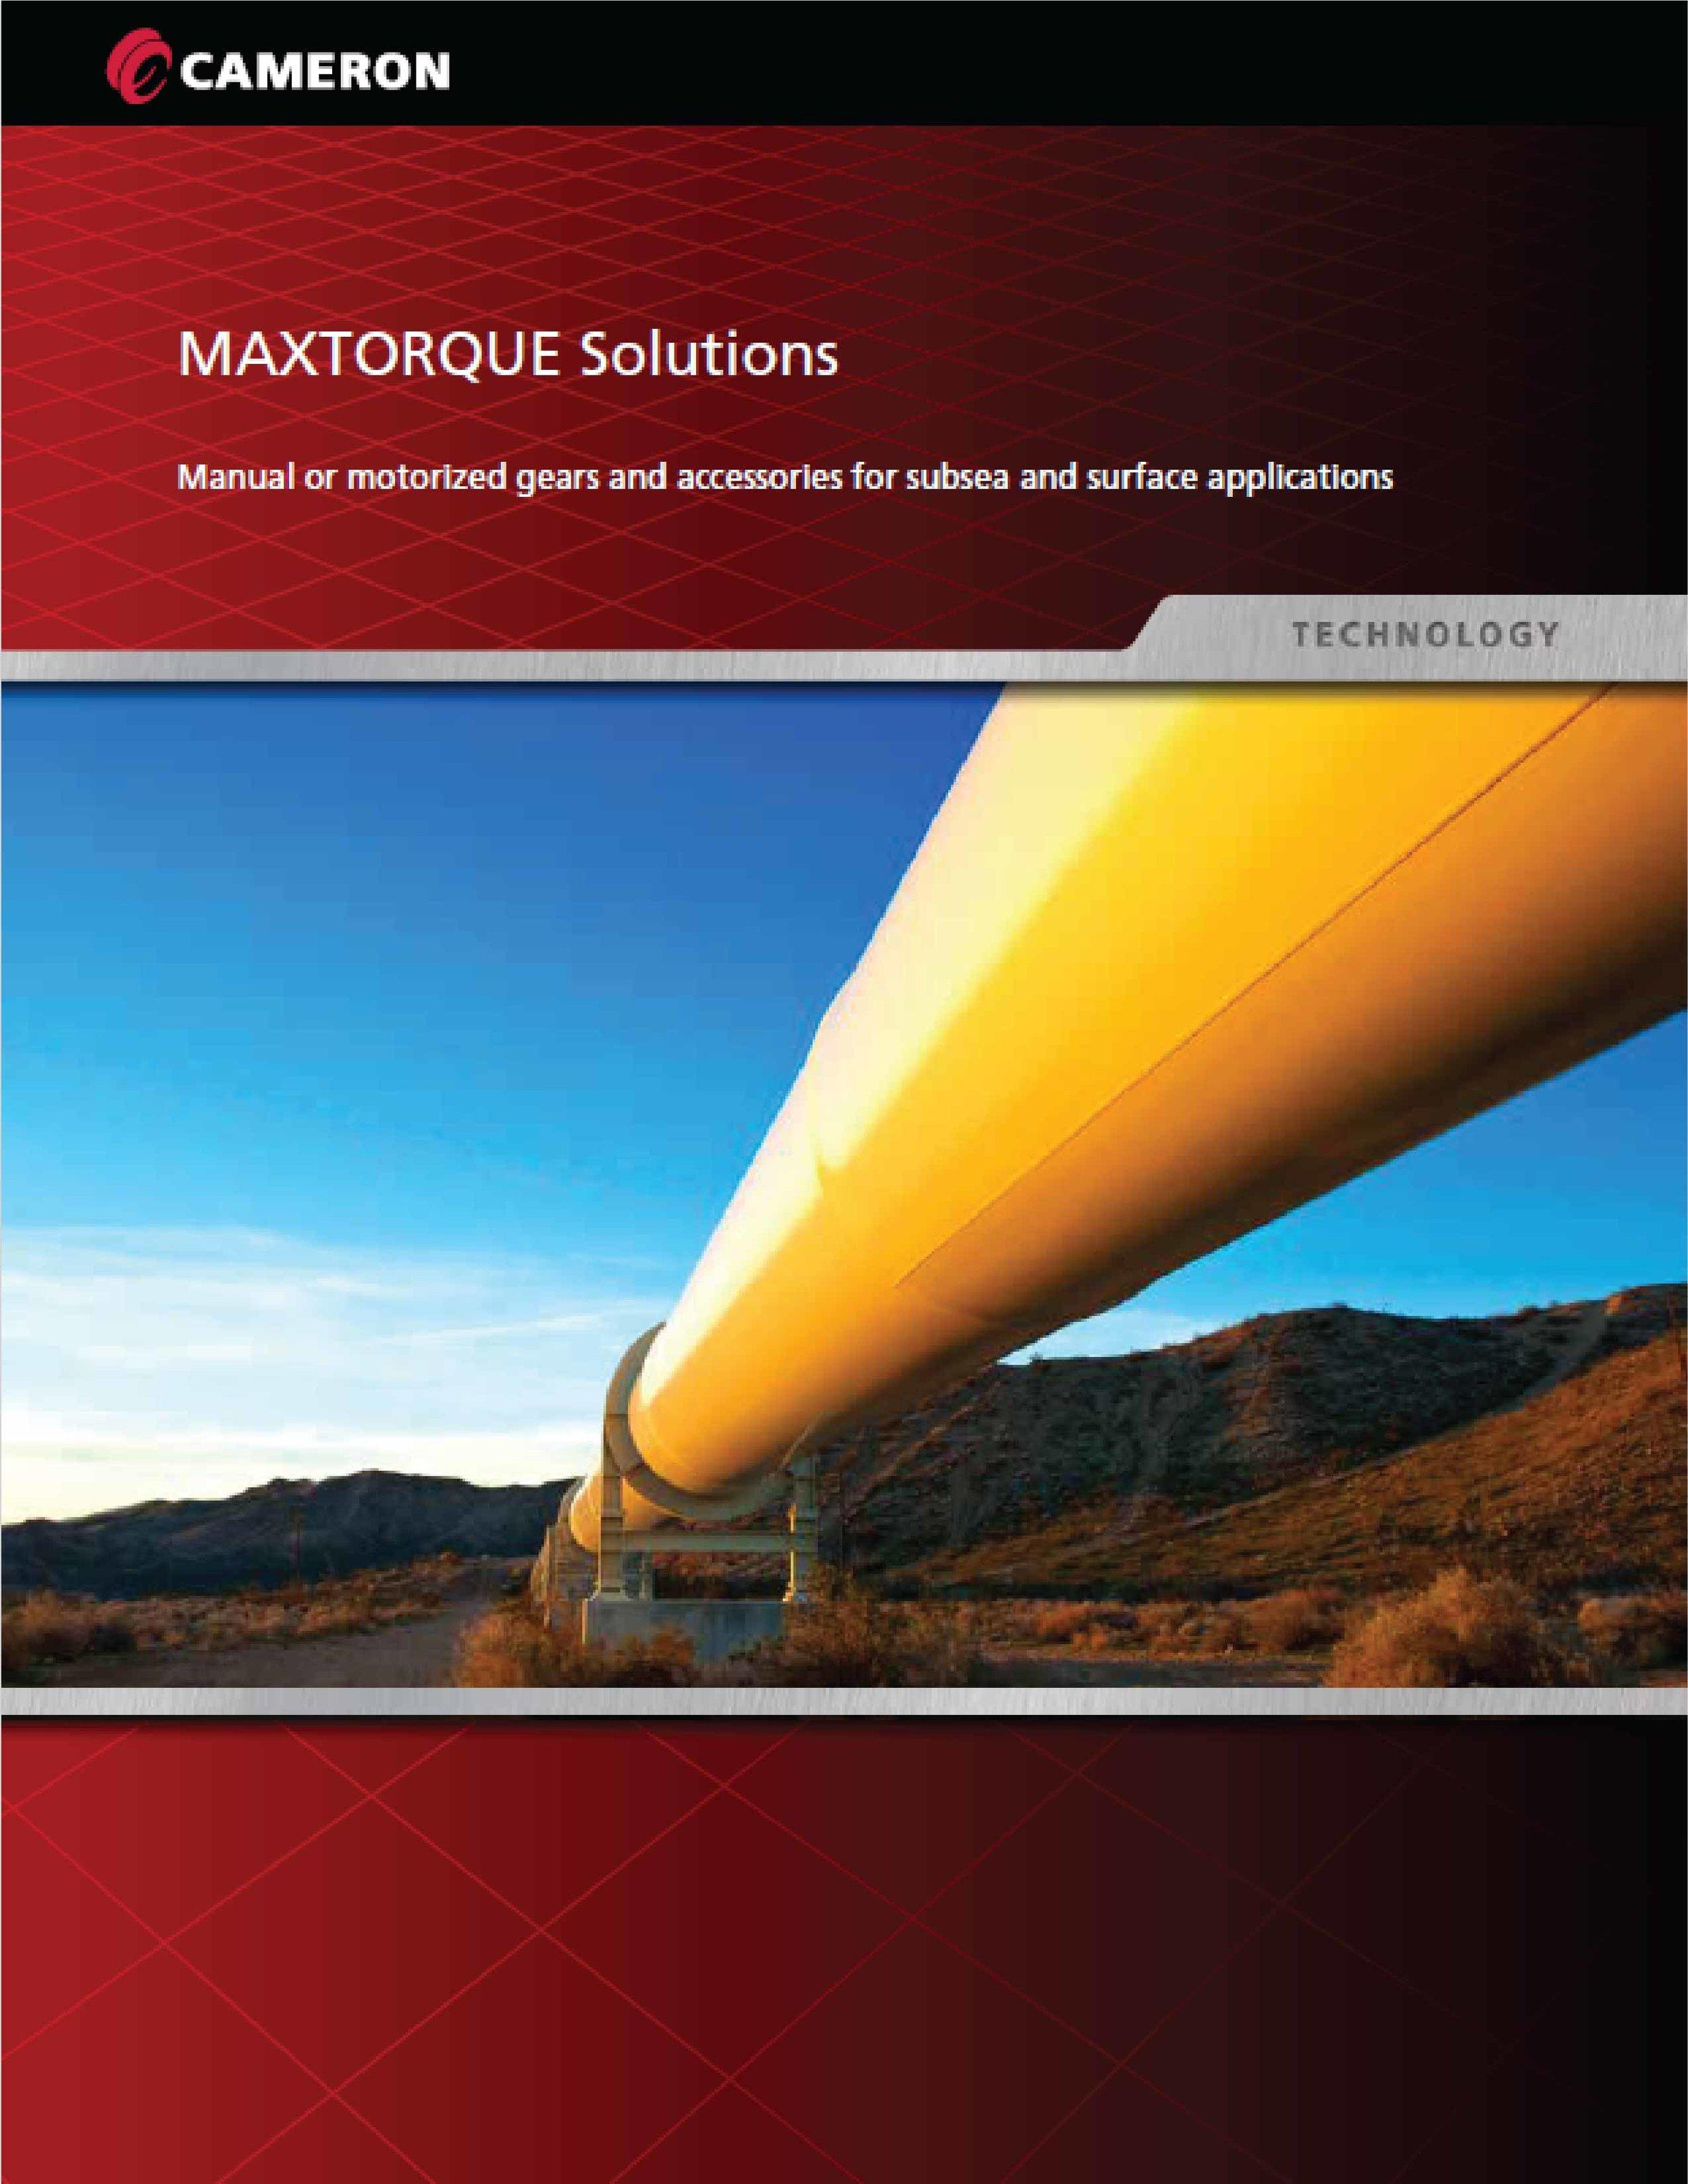 Maxtorque-brochure-01.jpg